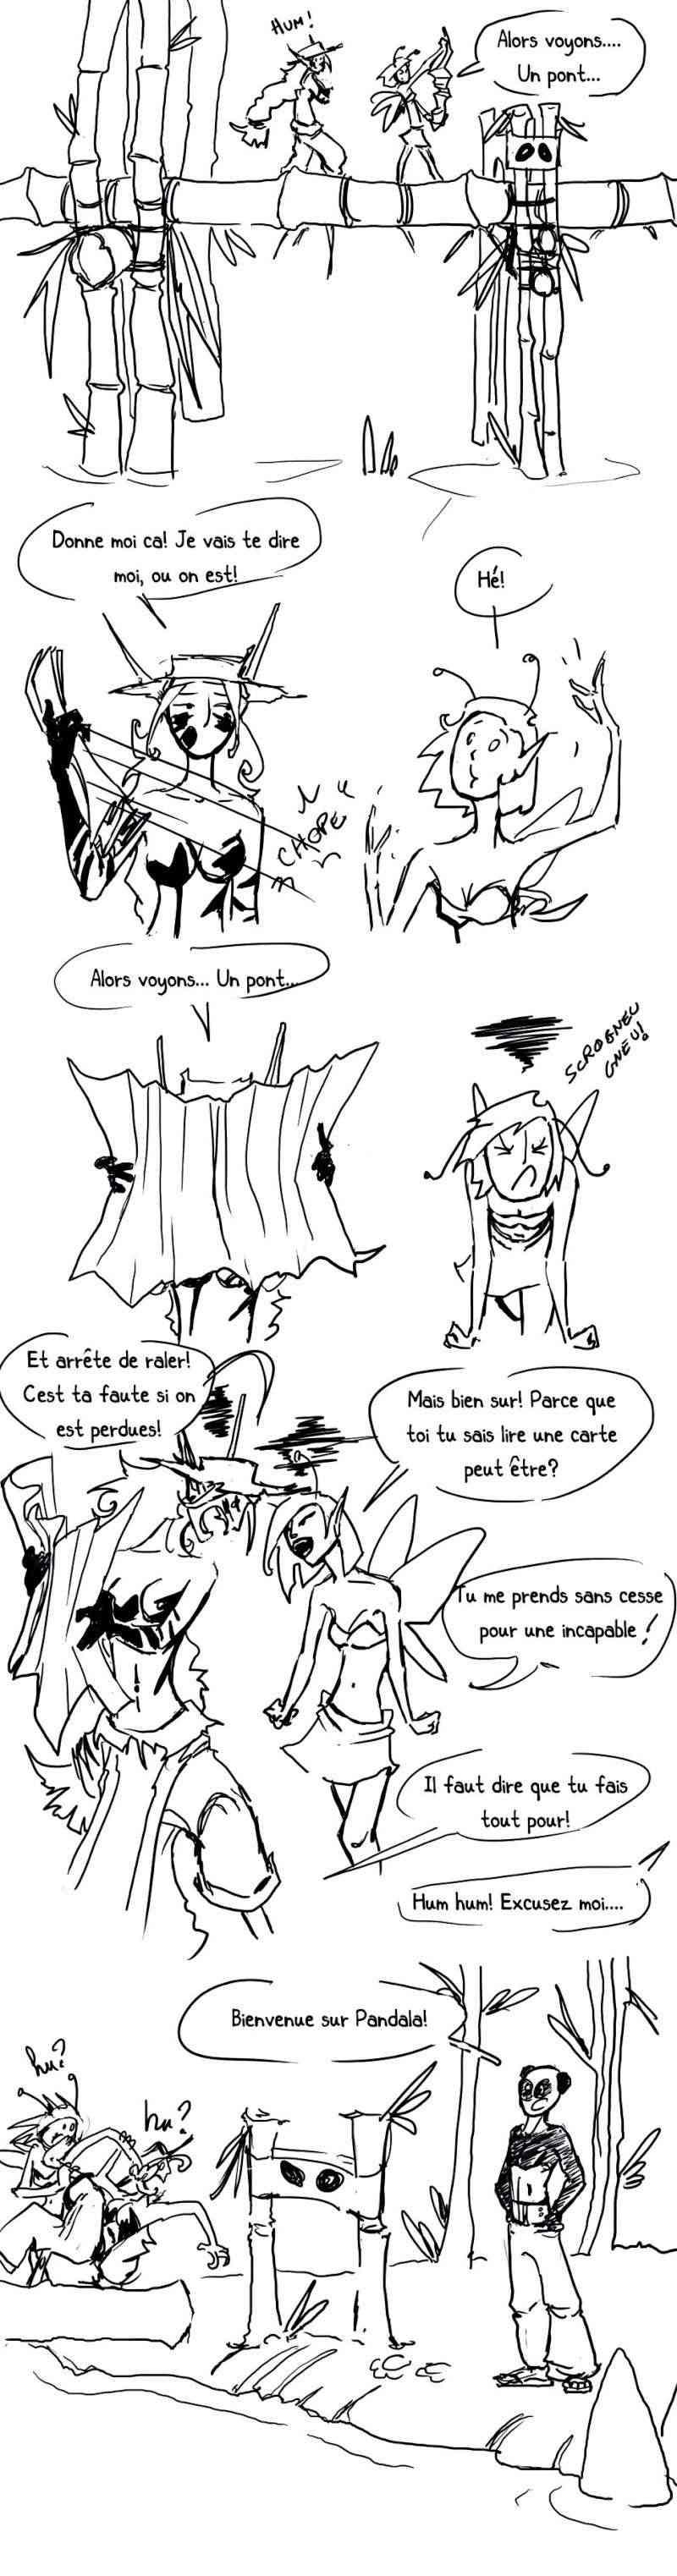 seik et ekis, les aventures ILLUSTREES - Page 2 Strip312